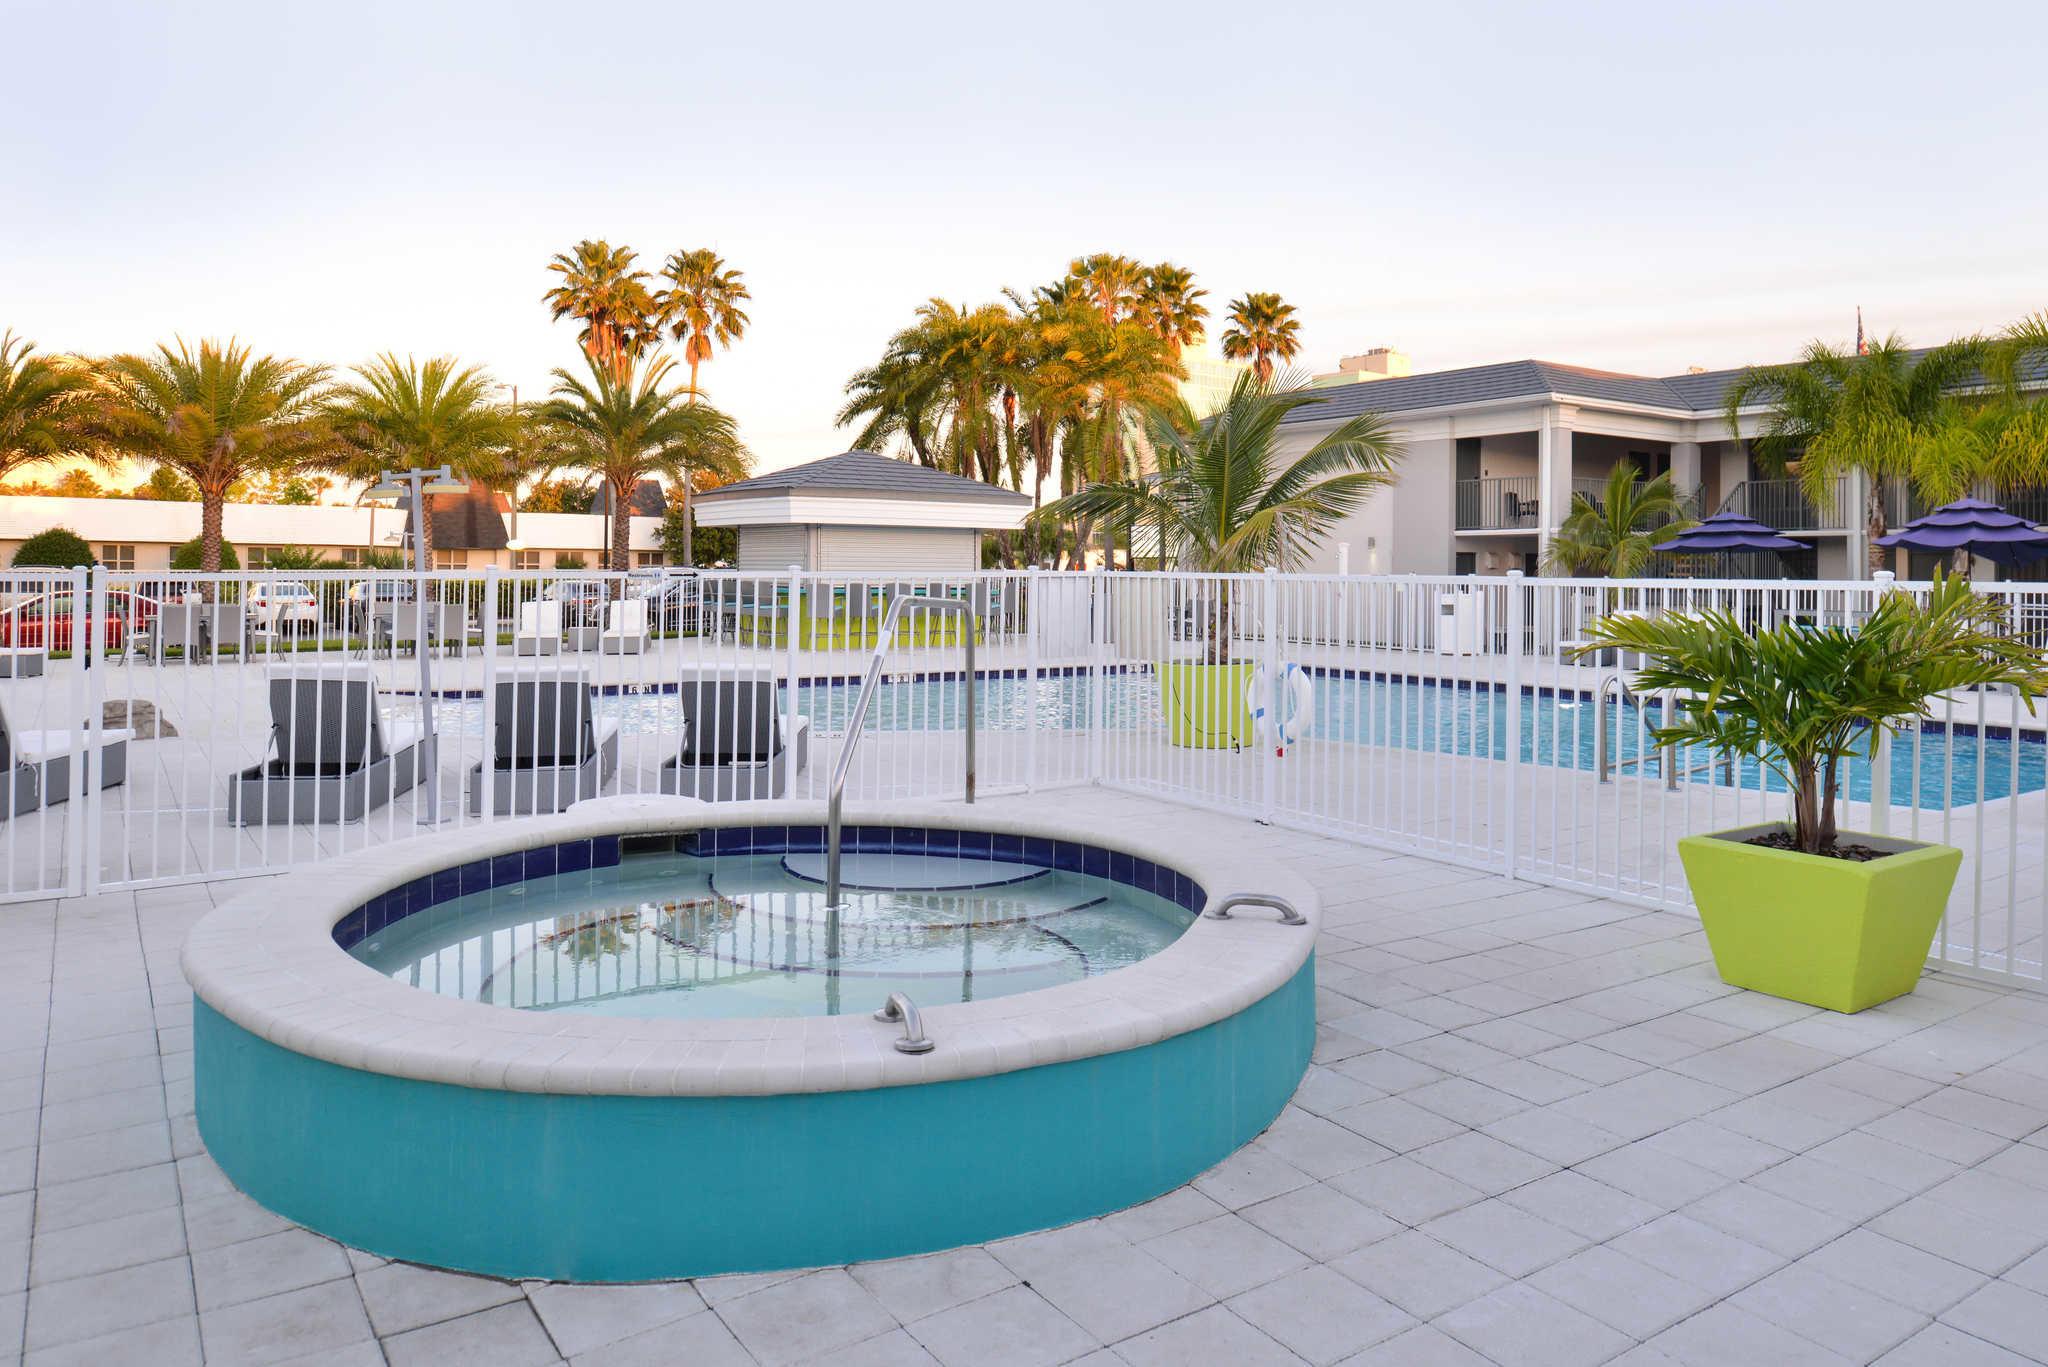 Clarion Inn & Suites Orlando near Theme Parks image 22